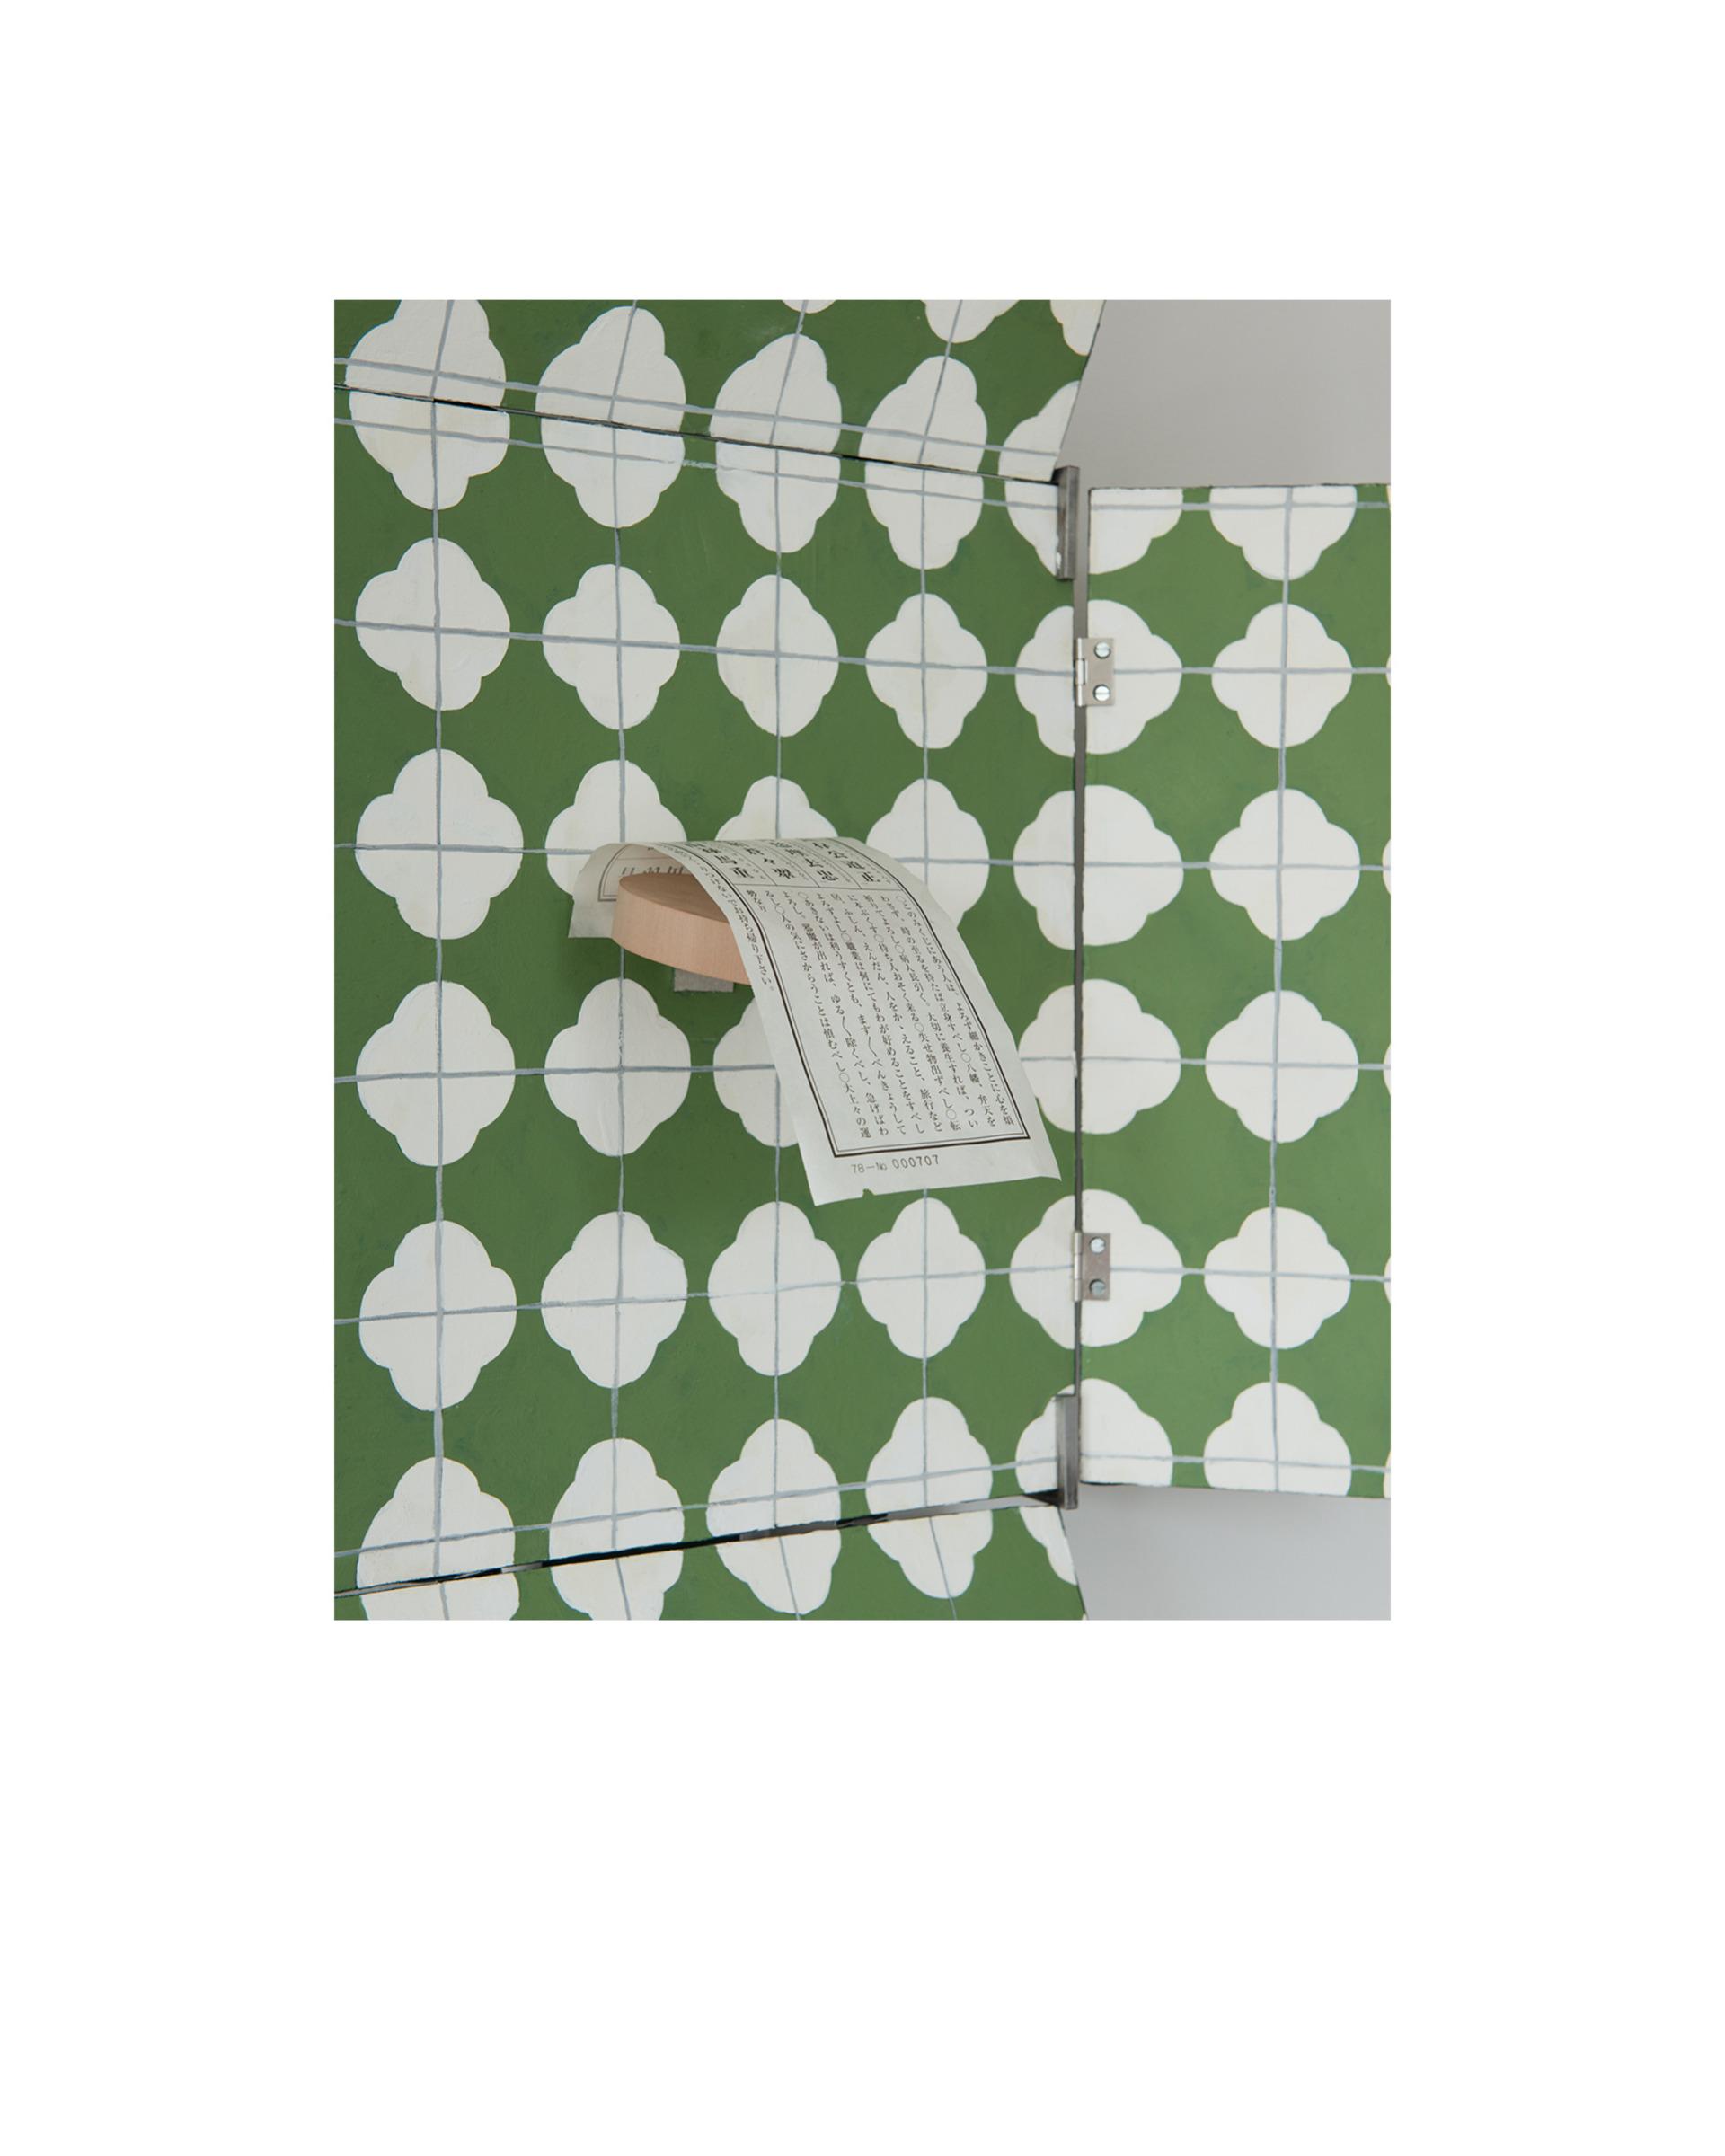 [Detail] Aluminium, chemiwood, hinge, Japanese paper, paint, plywood, mild steel